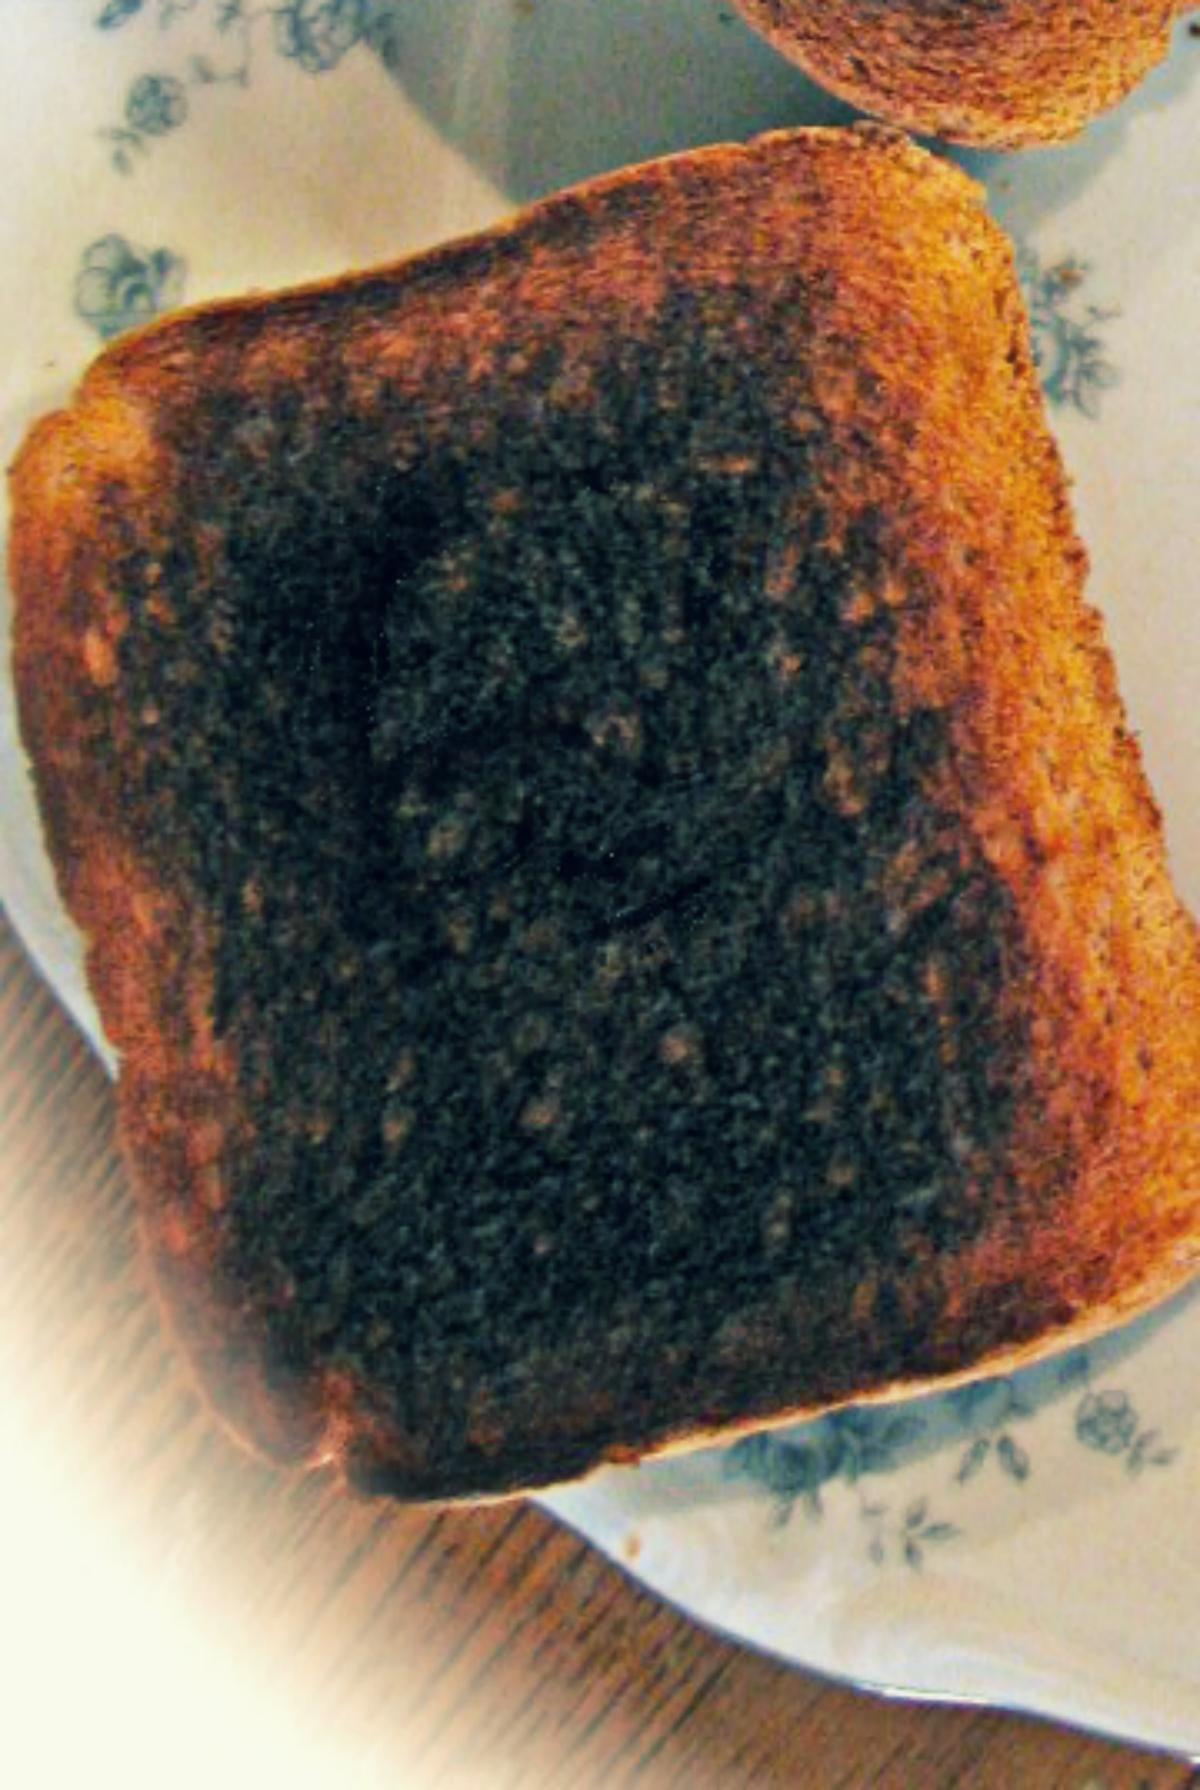 Skrillex Toast